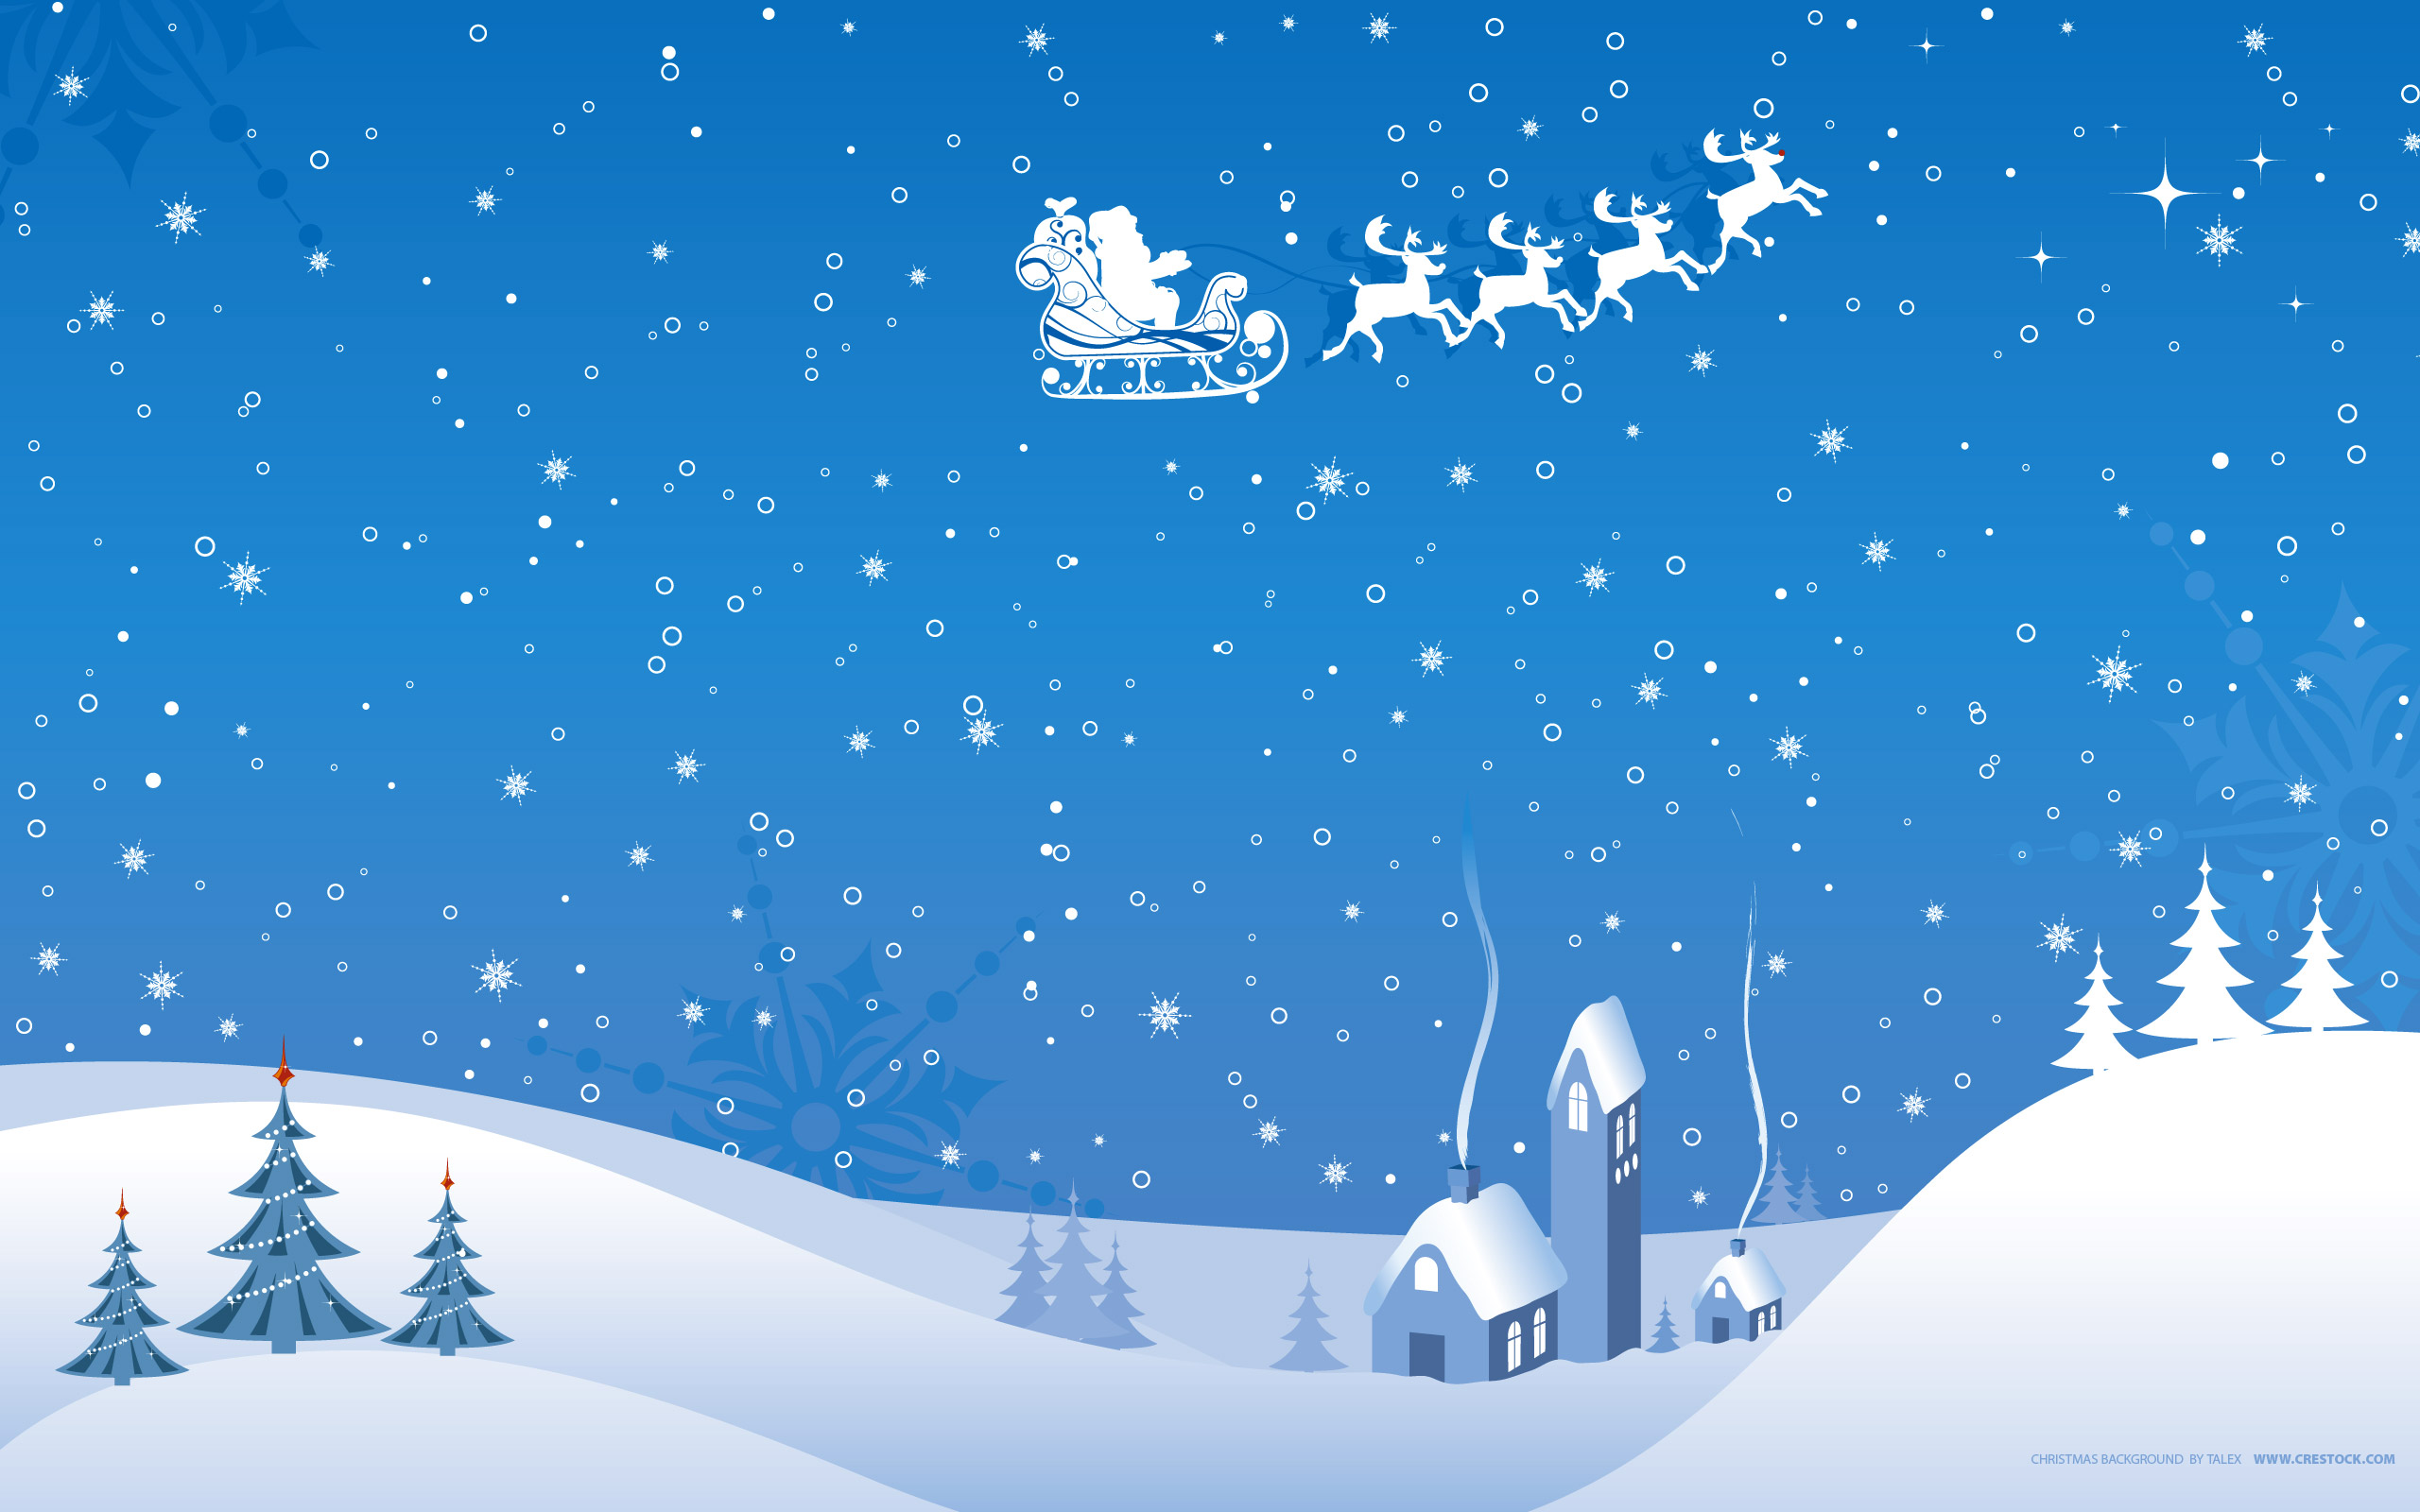 Abstract 3d Christmas Wallpaper 1280 X 1024 9777 Hd Wallpapers 2560x1600